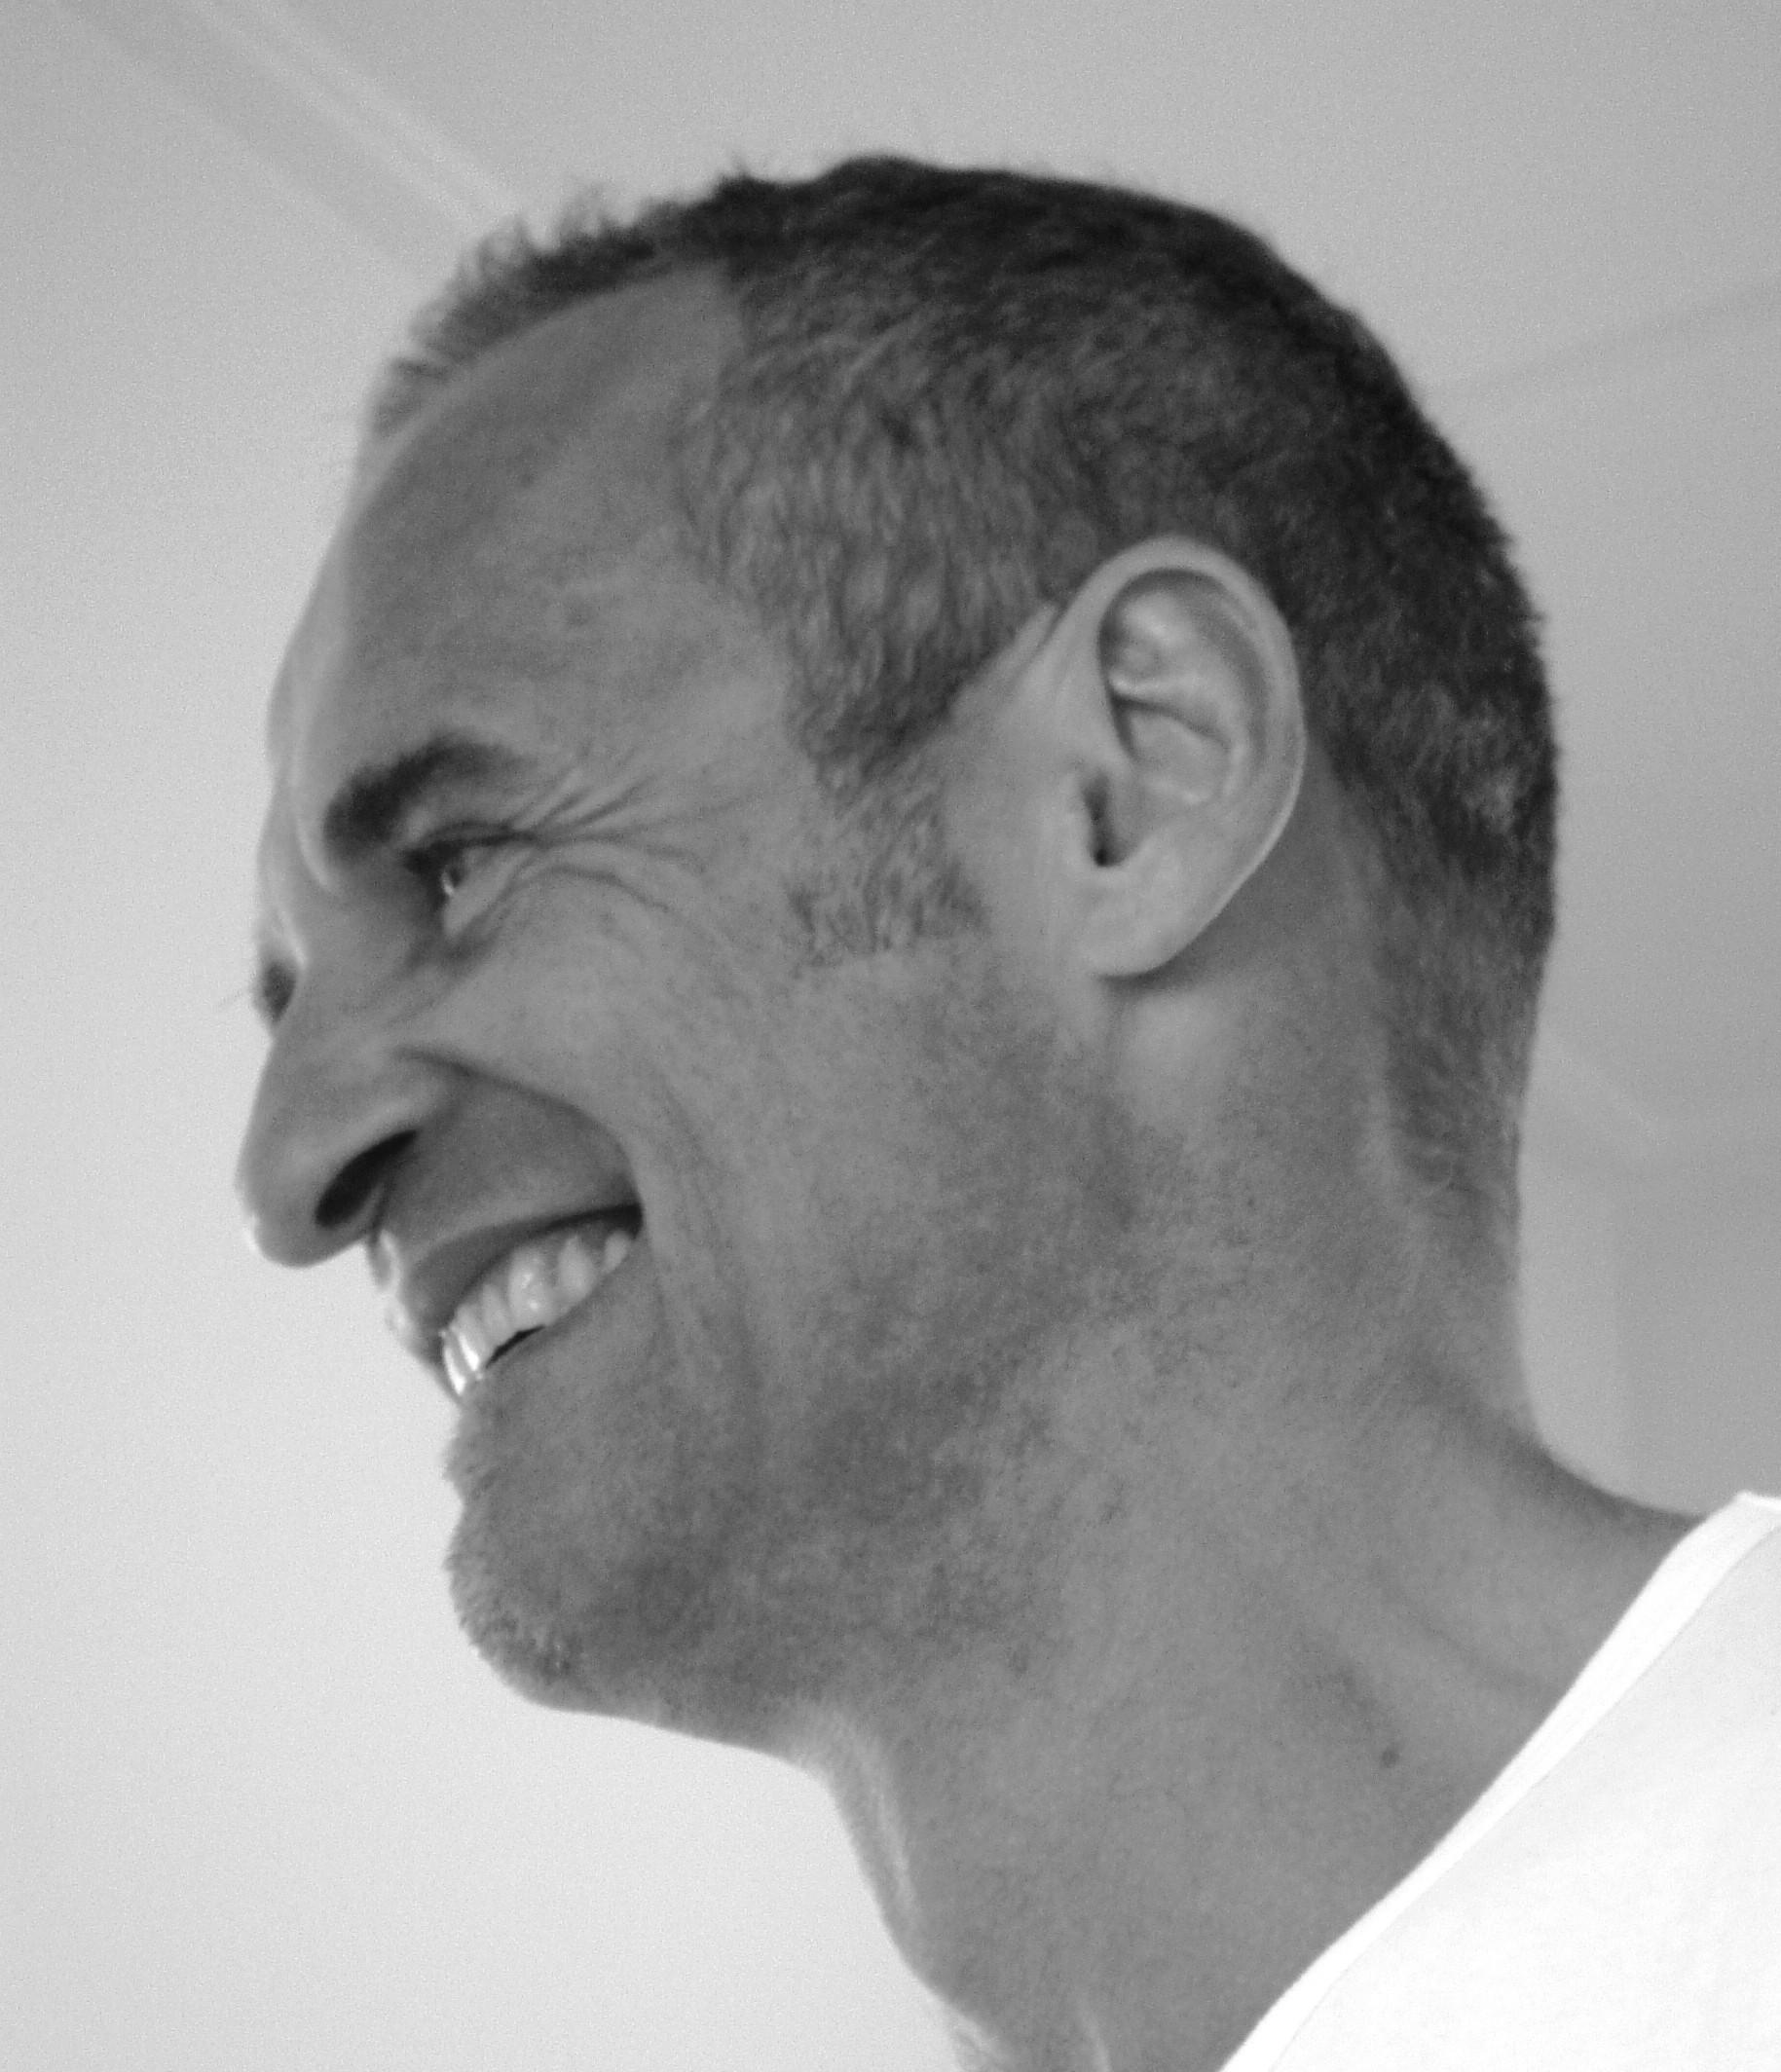 Günter Pütz